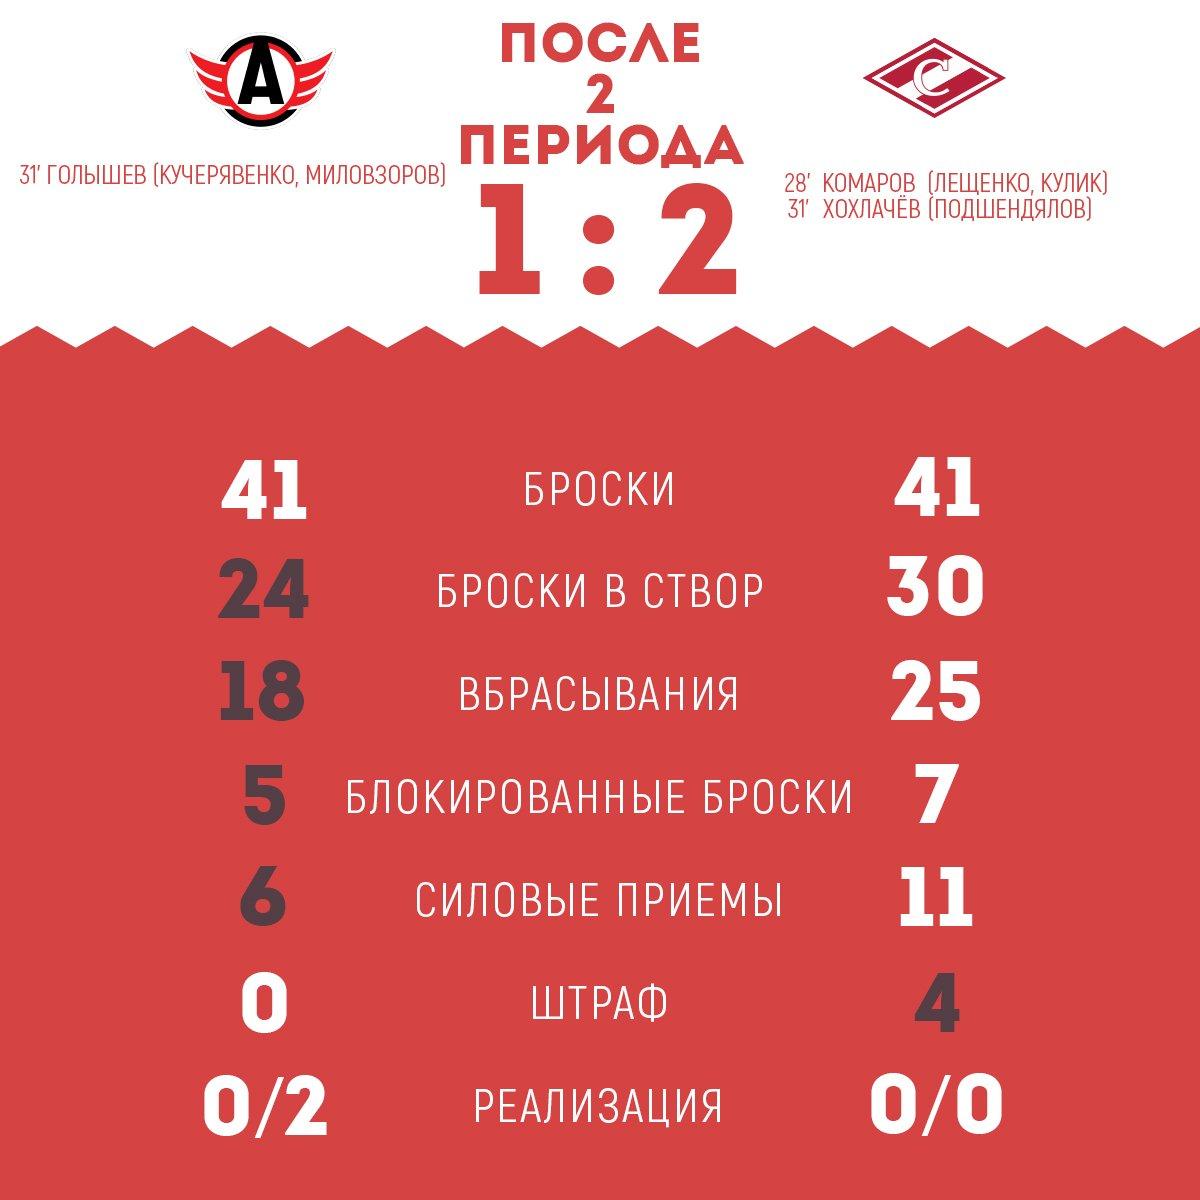 Статистика матча «Автомобилист» vs «Спартак» после 2-х периодов